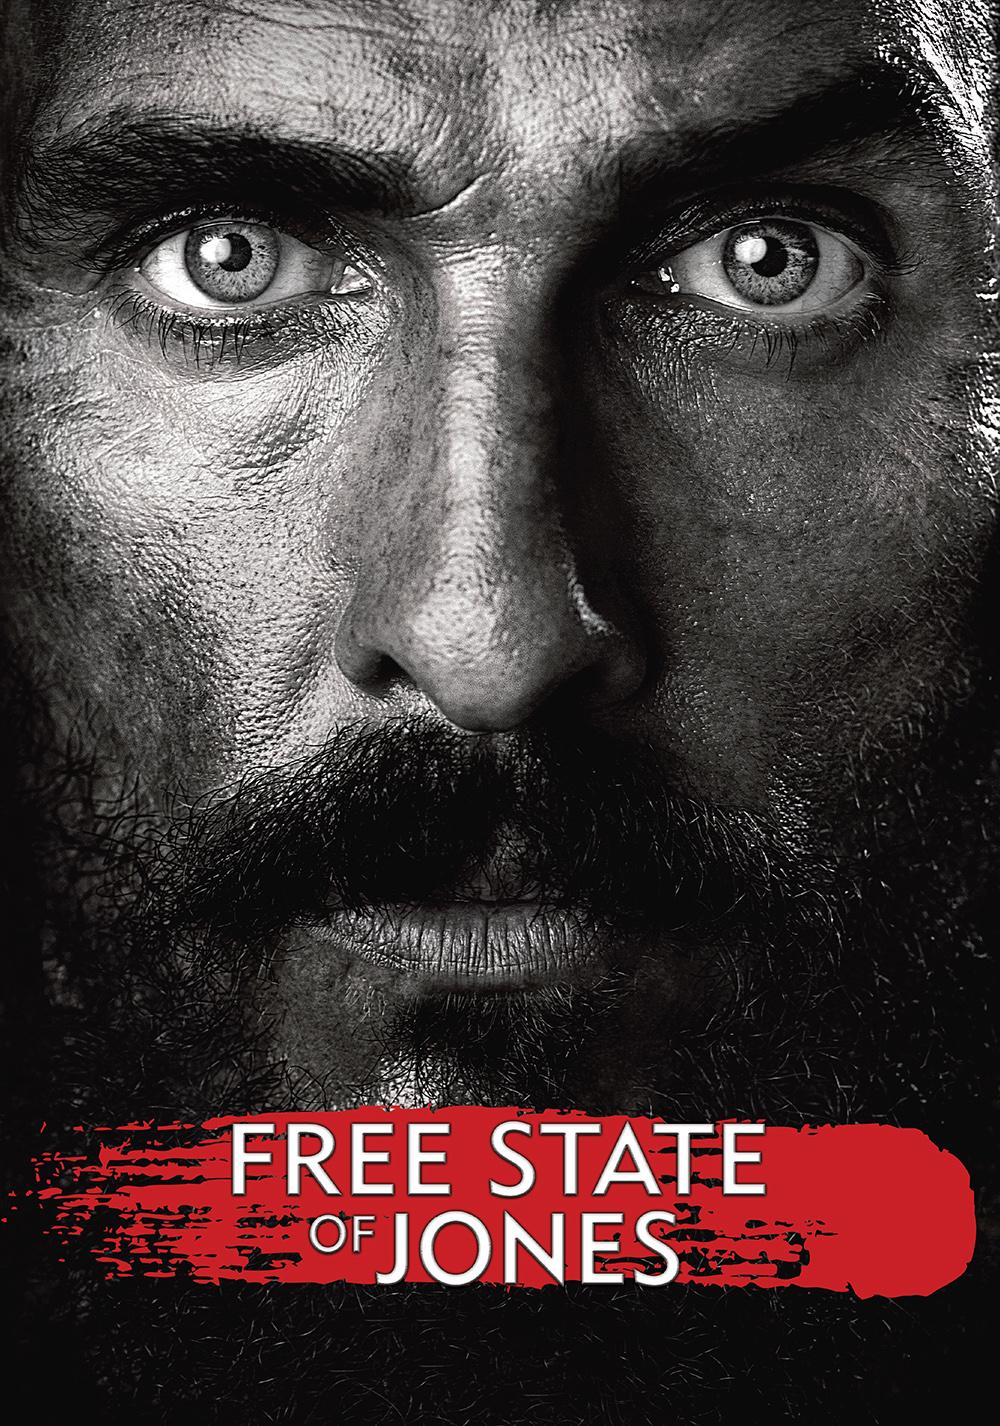 Free State Of Jones Film